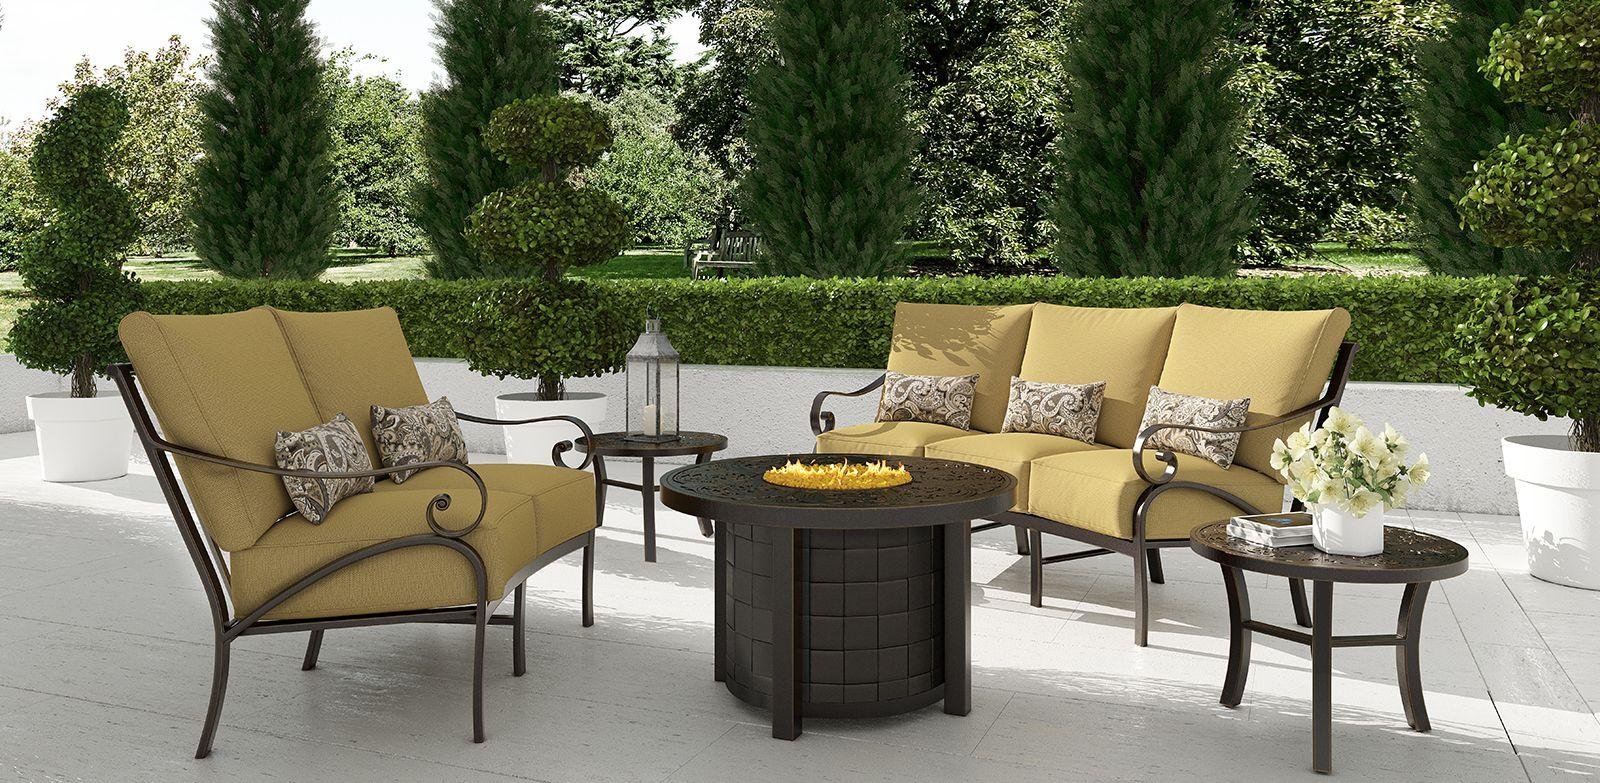 Castelle Patio Furniture Warranty Patio Outdoor Furniture Sets